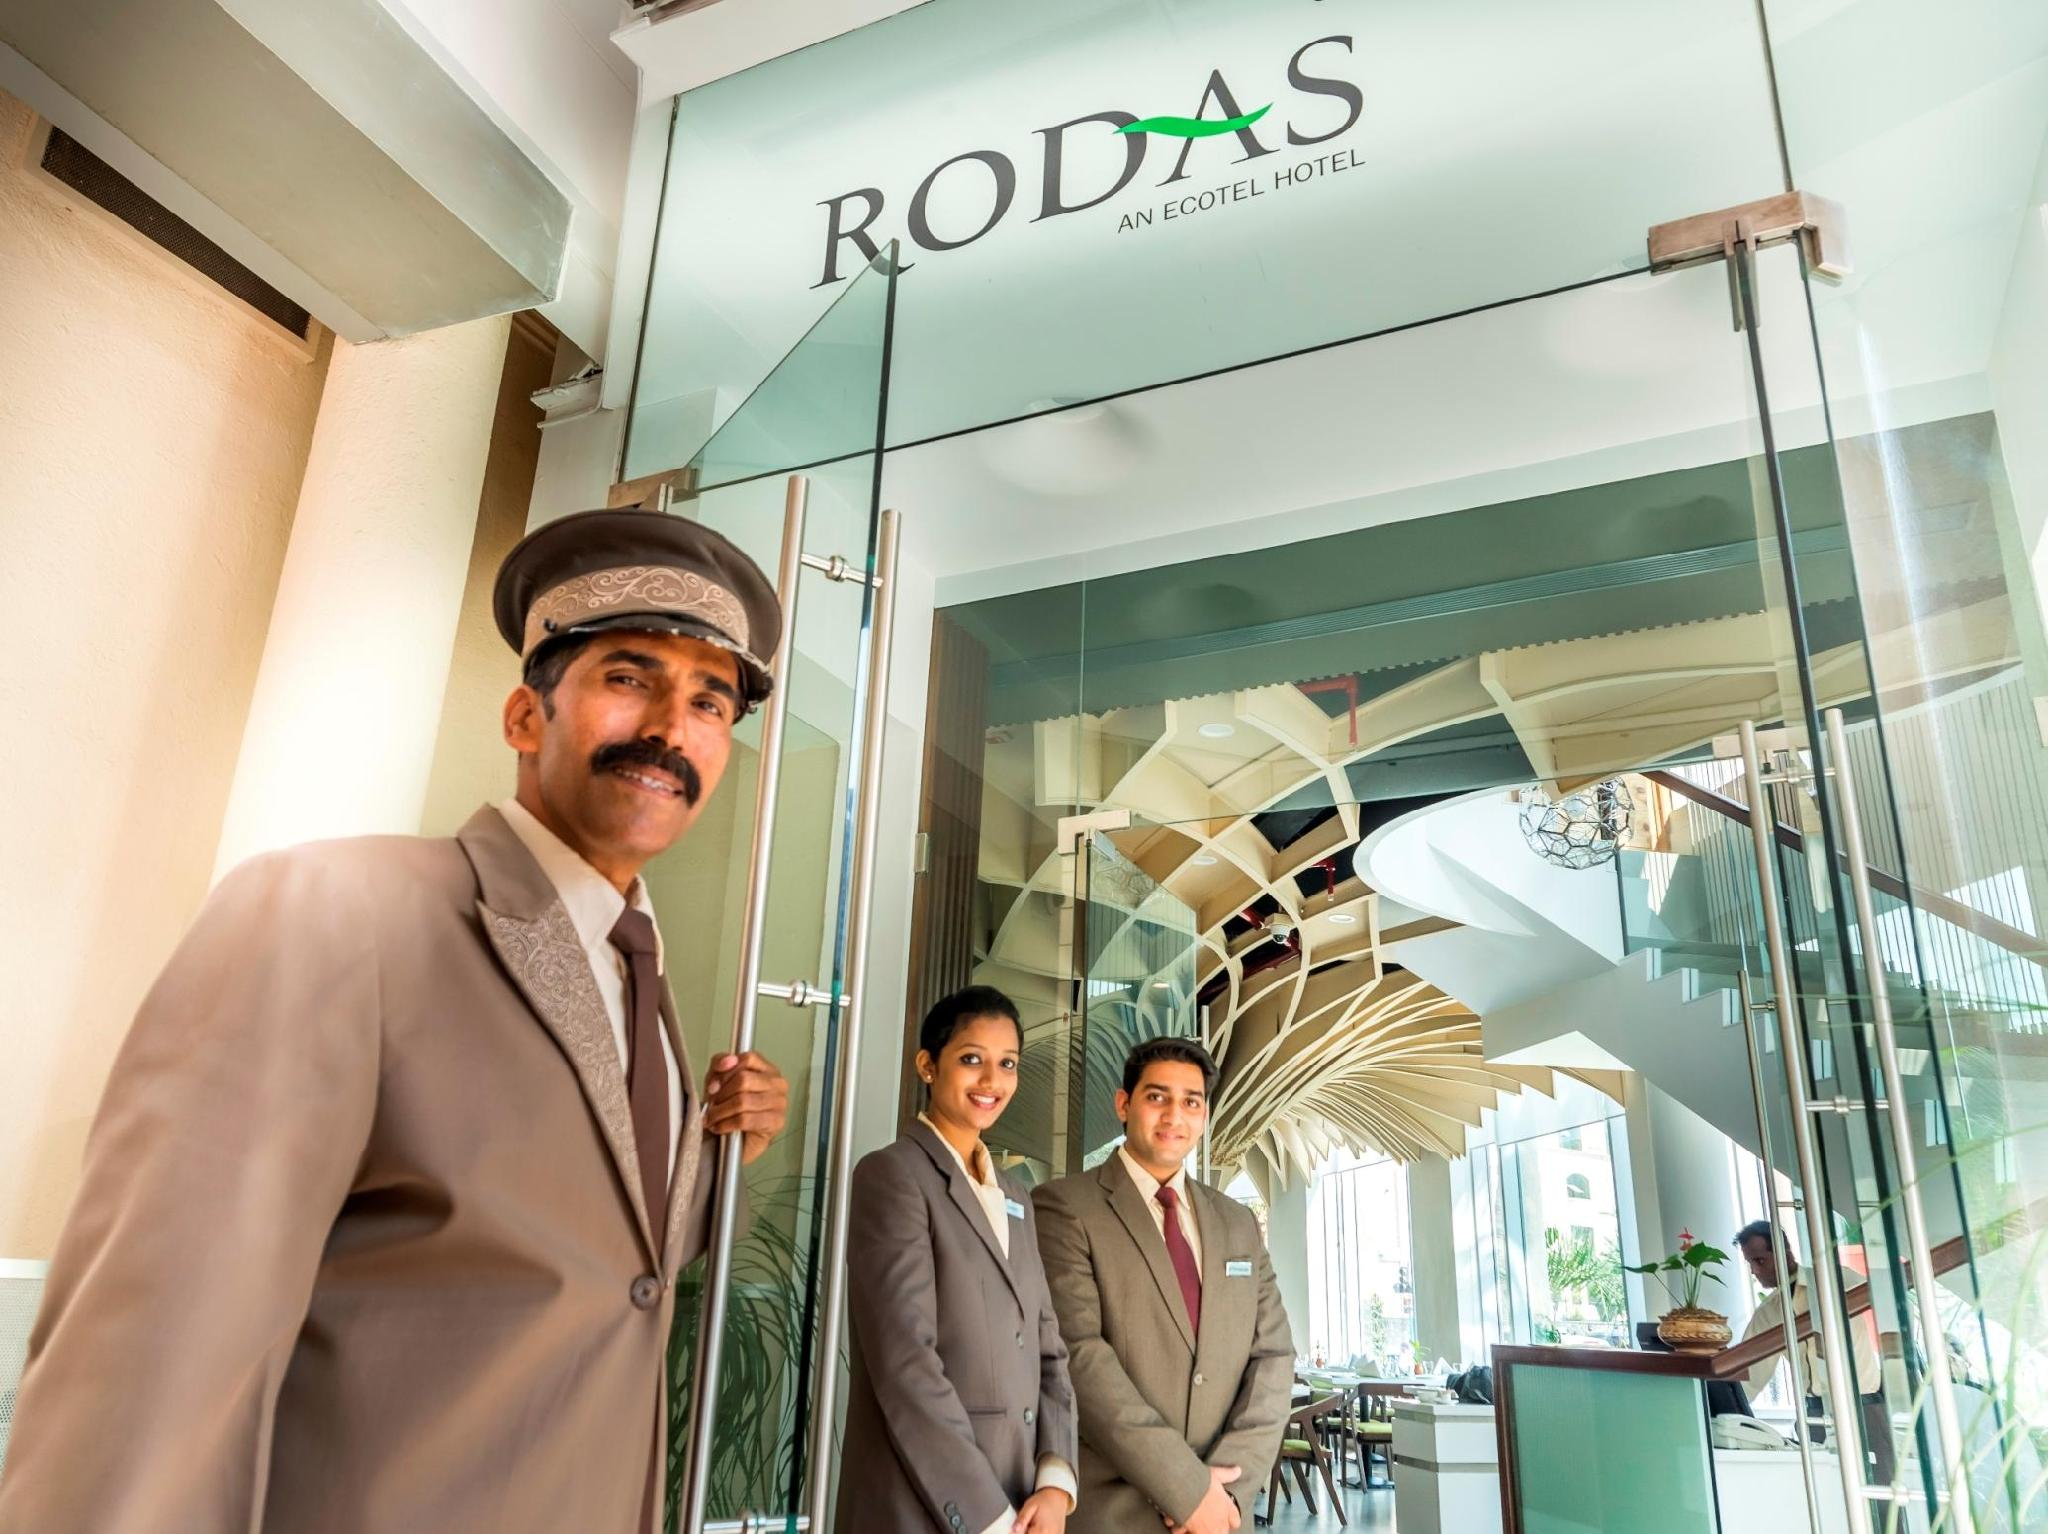 Rodas An Ecotel Hotel